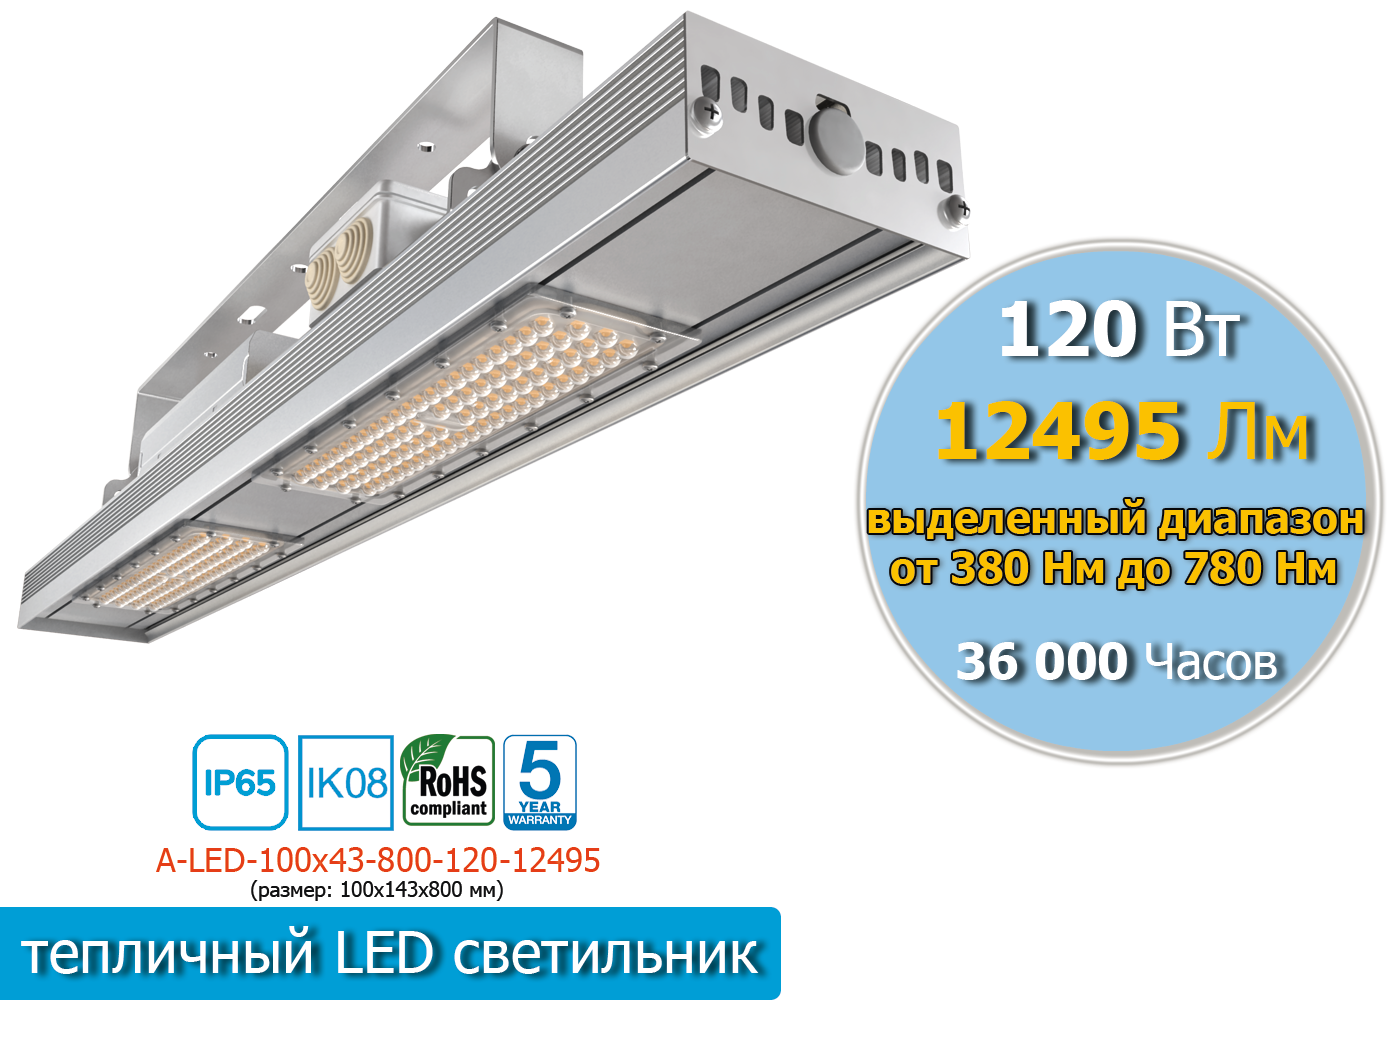 A-LED-100х43-1-800-120-12495